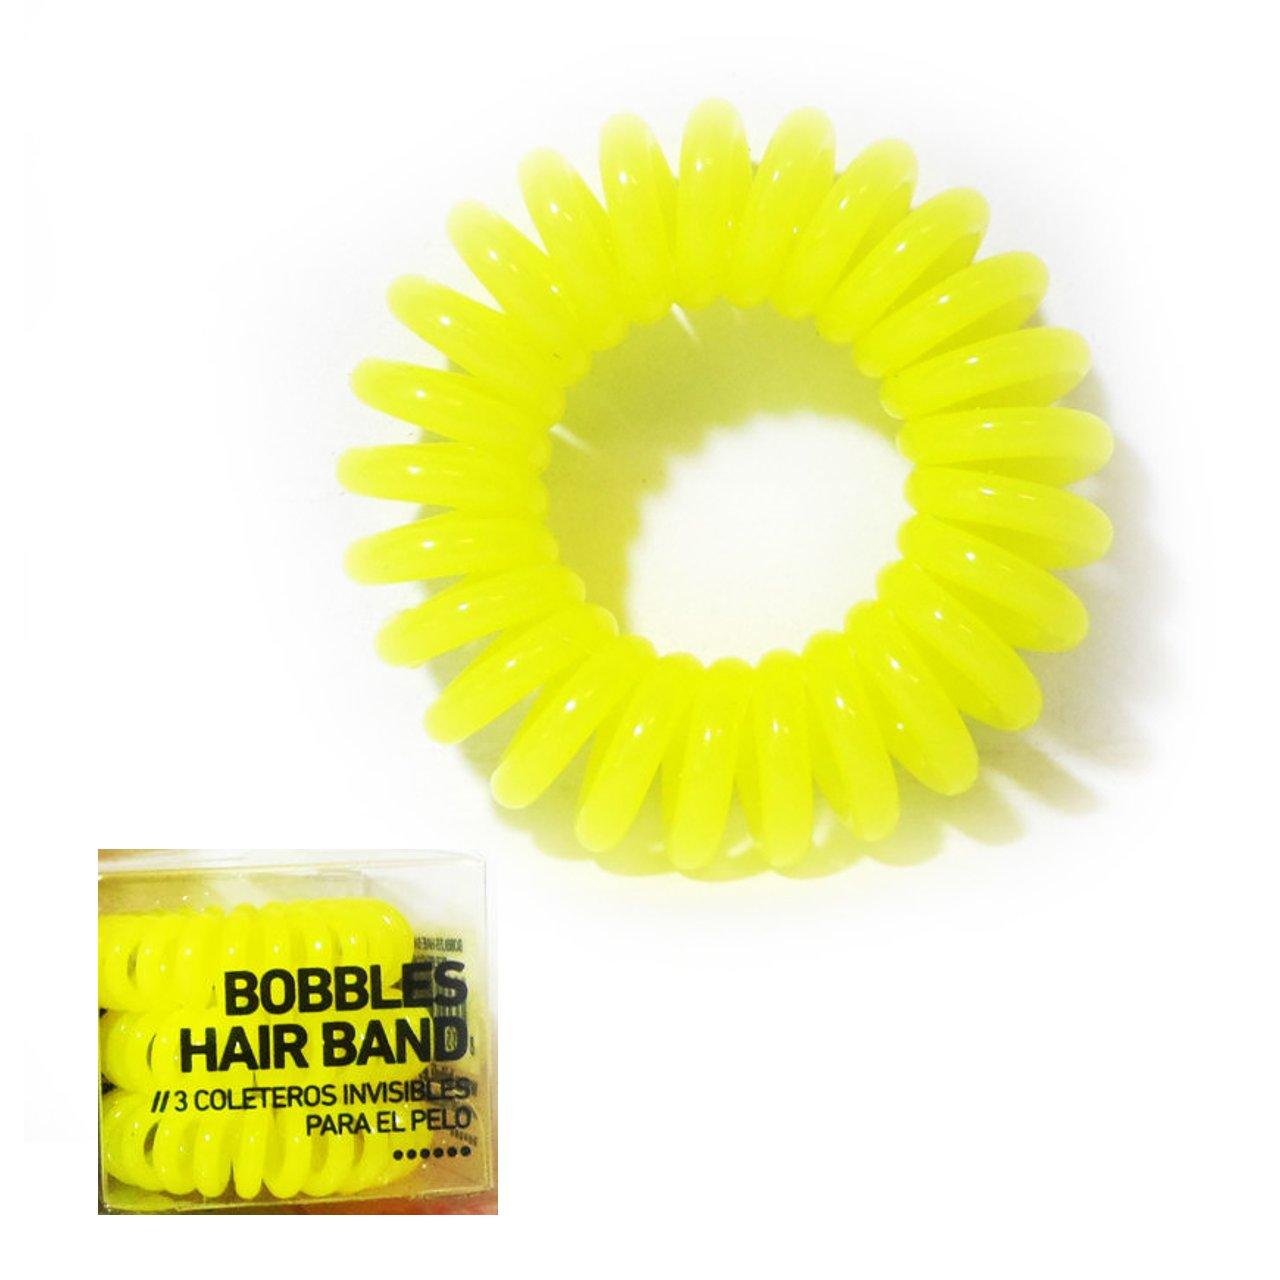 BIFULL Bobbles Hair Band - (Amarillo) žlutá gumička na vlasy W Objem: 1 ks ml